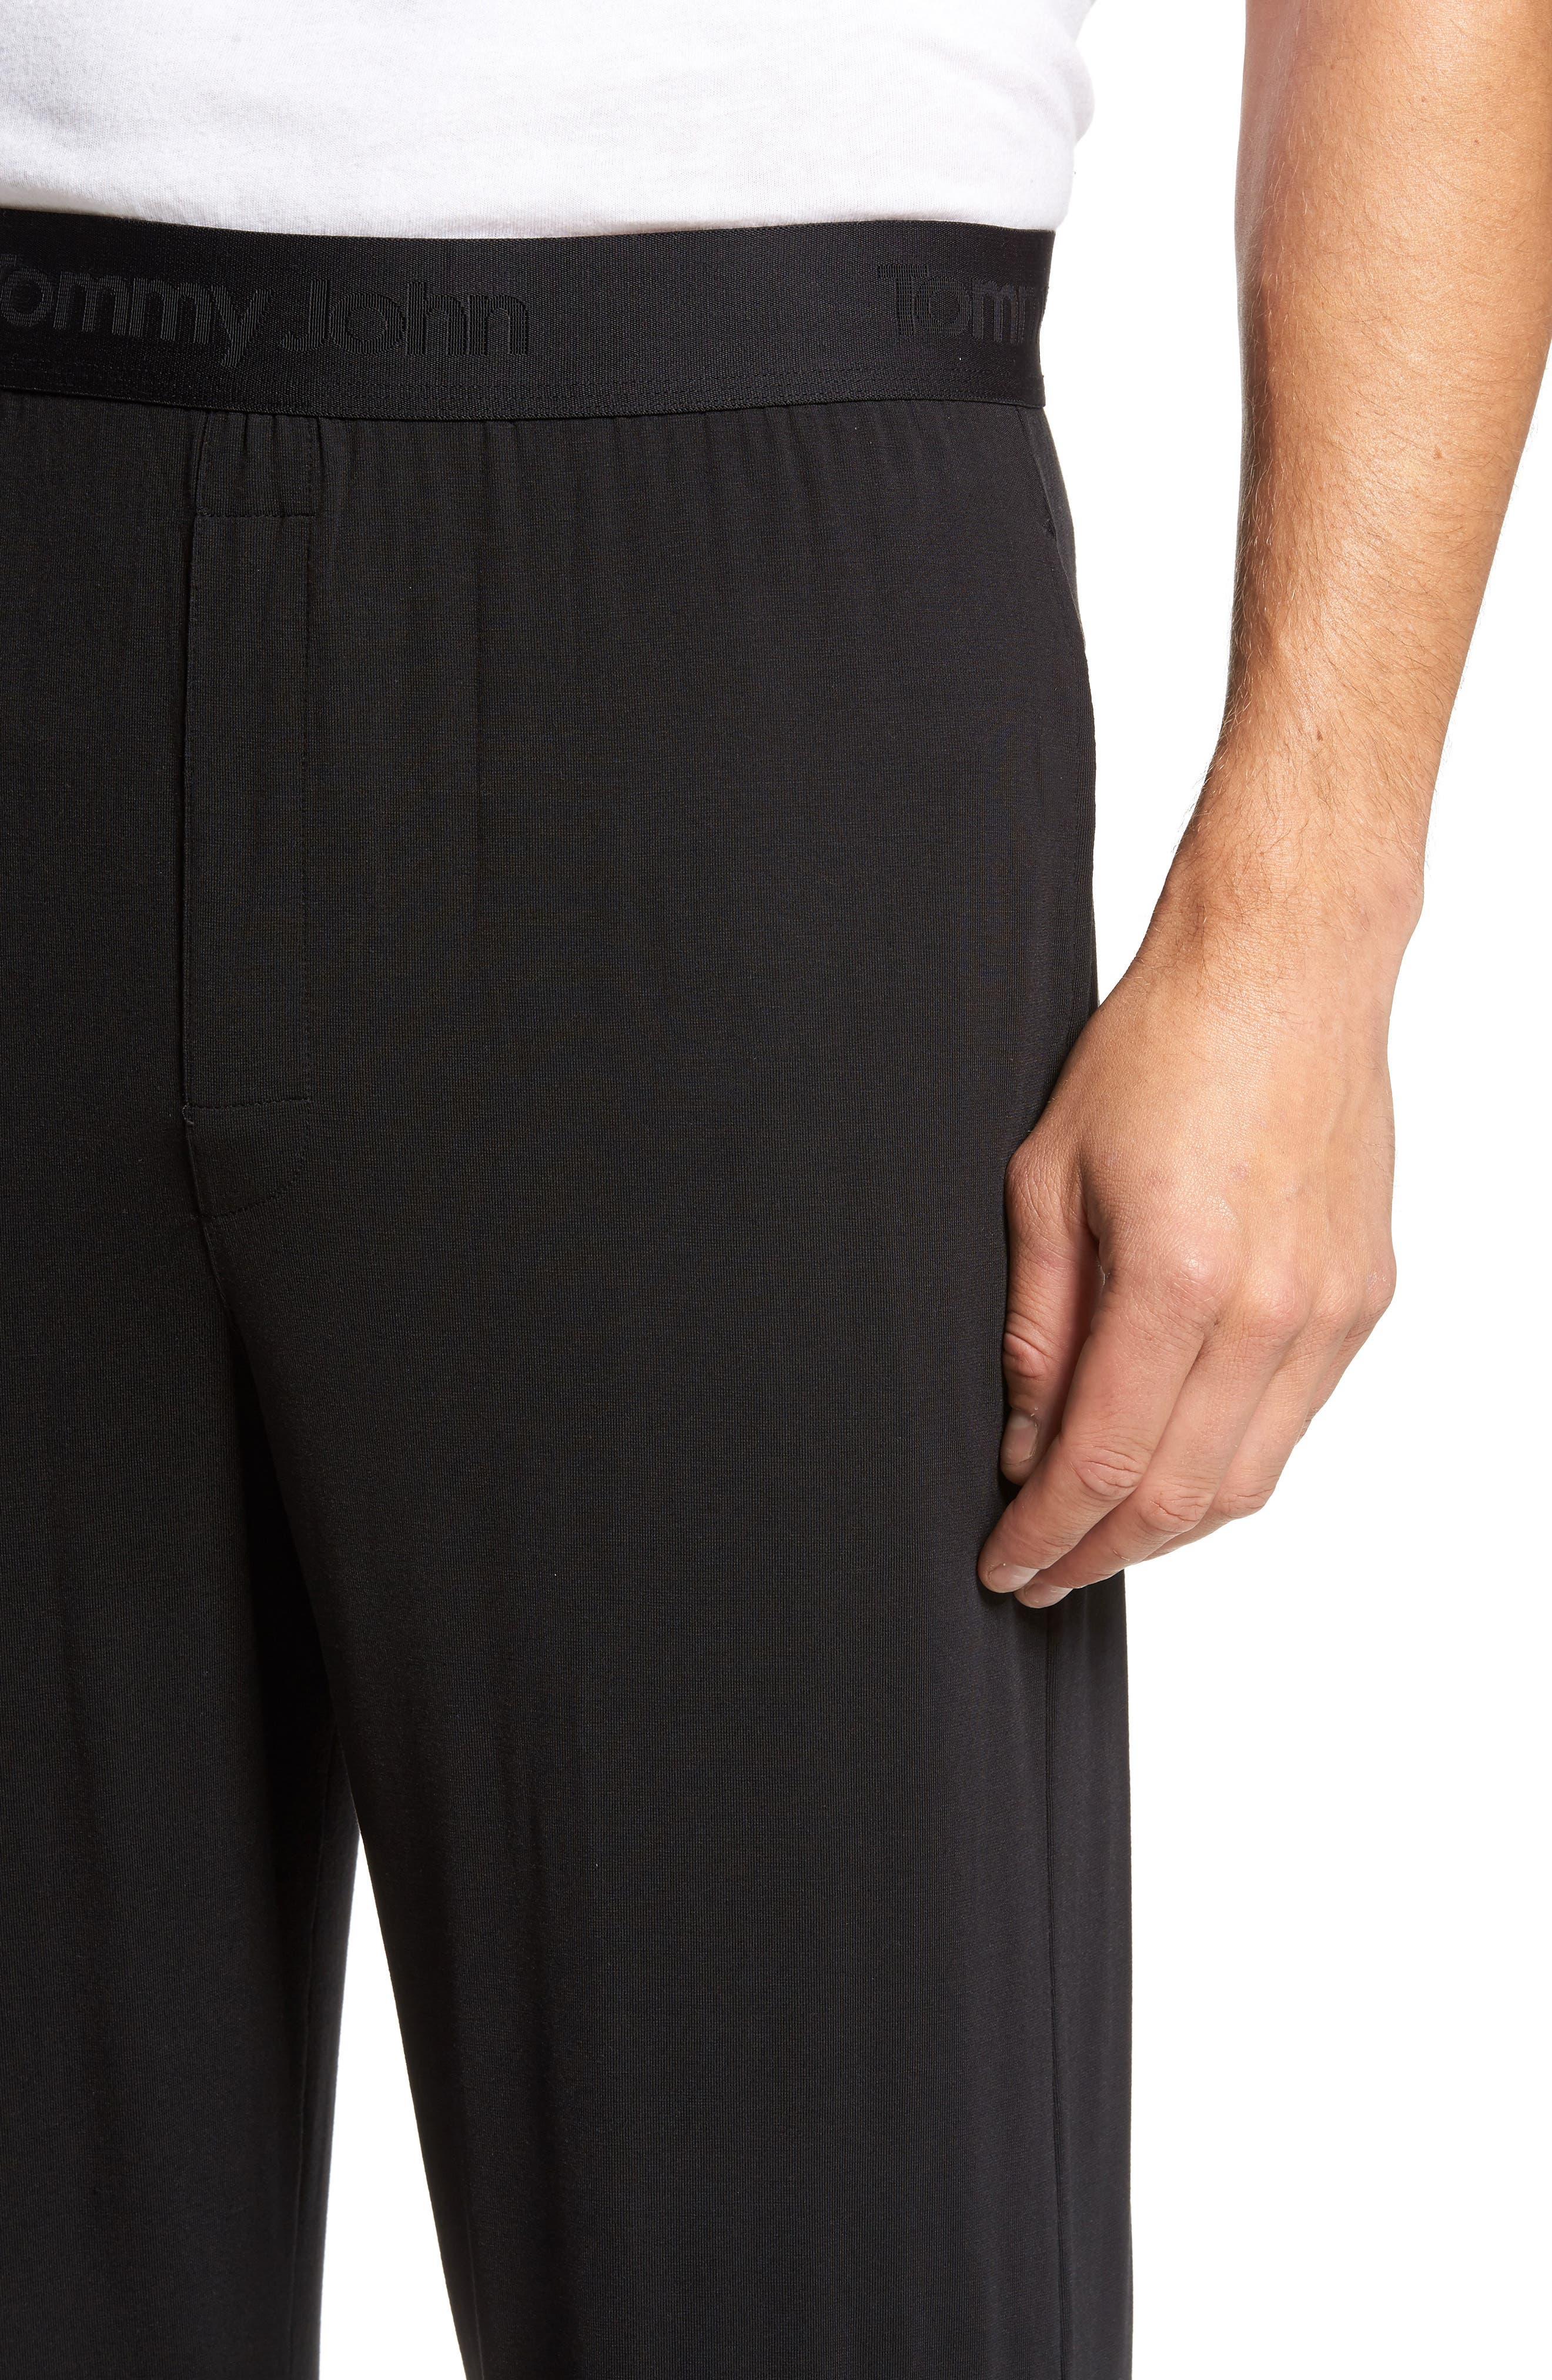 Second Skin Lounge Pants,                             Alternate thumbnail 4, color,                             BLACK